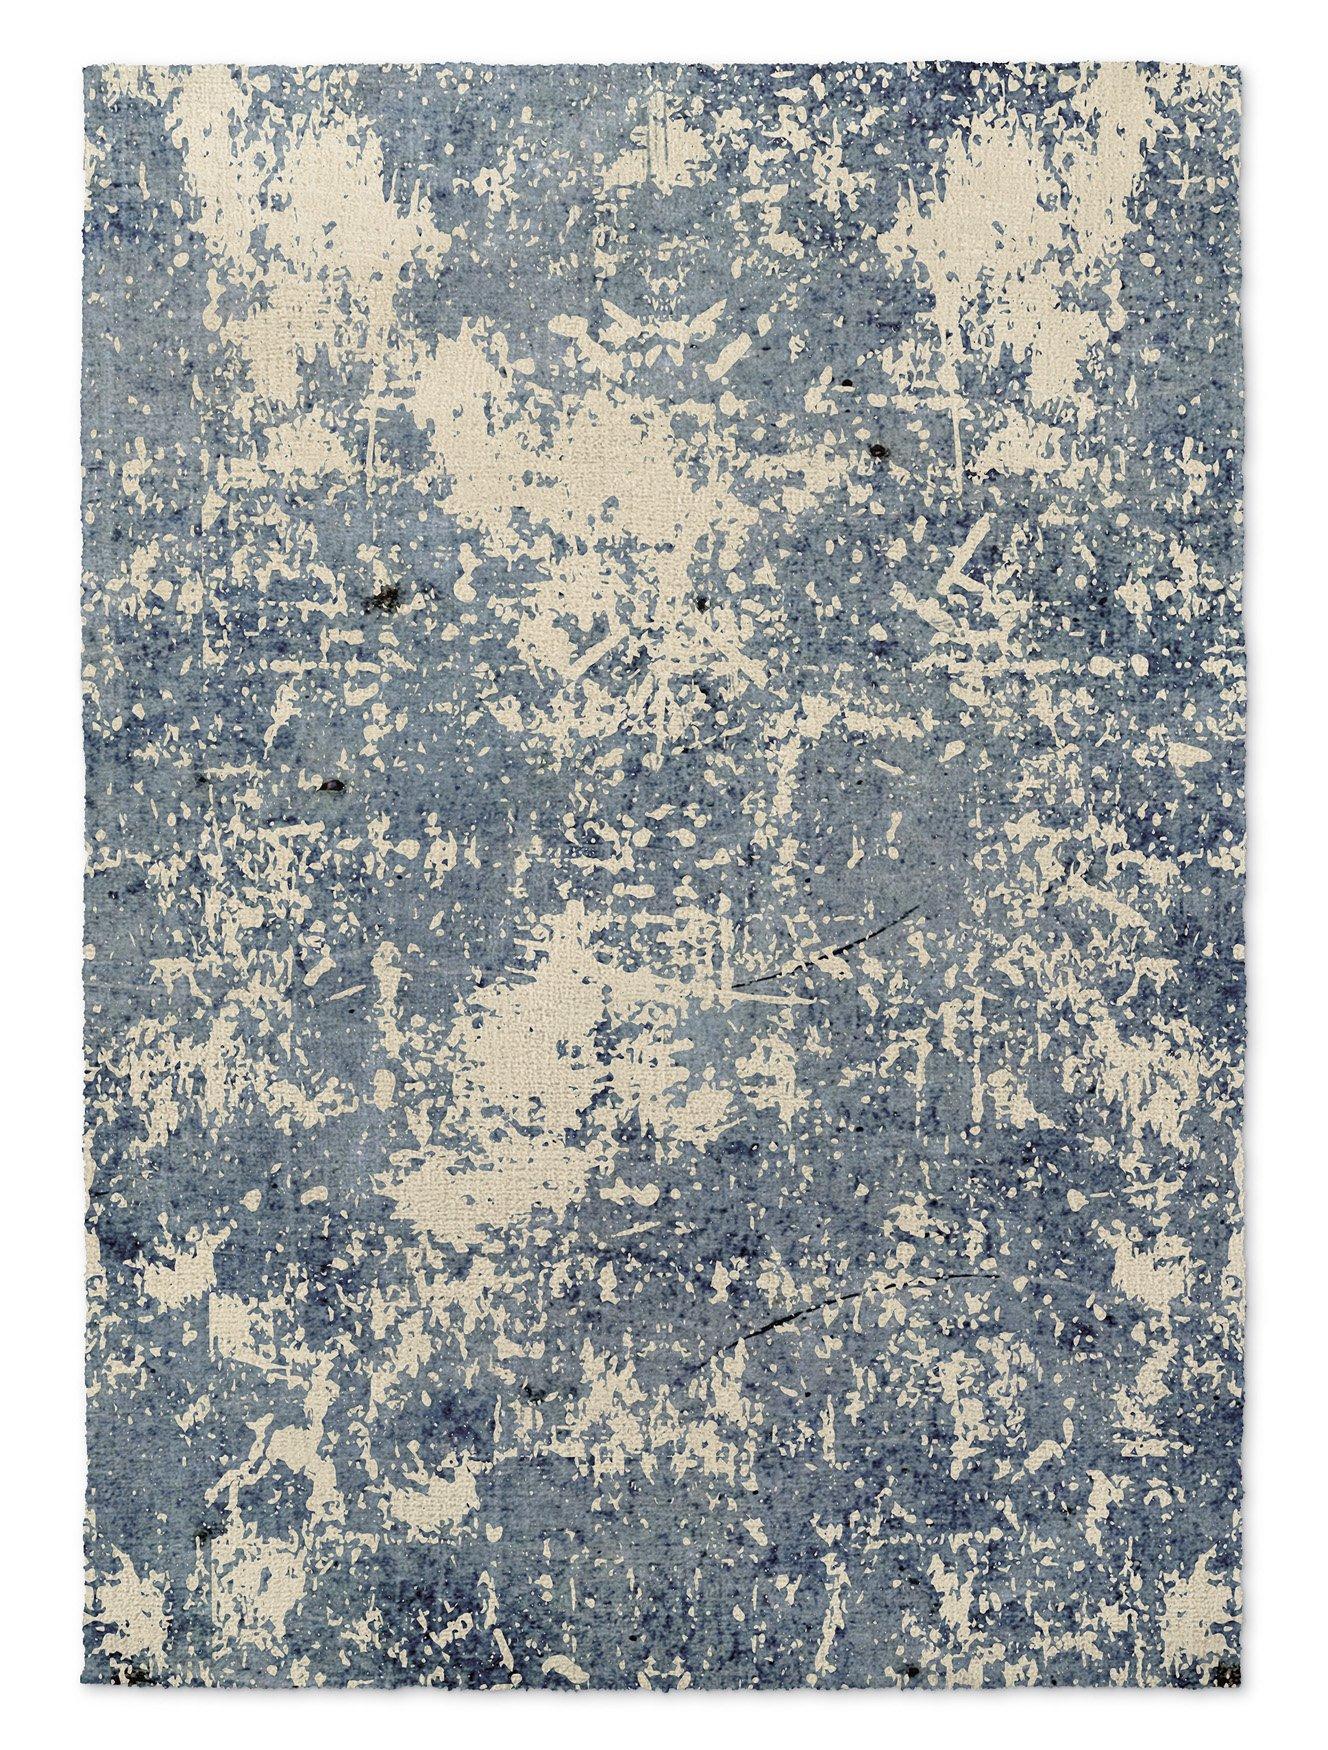 KAVKA Designs Tempe Area Rug, (Blue) - ENCOMPASS Collection, Size: 5x7x.5 - (TELAVC1465RUG57)